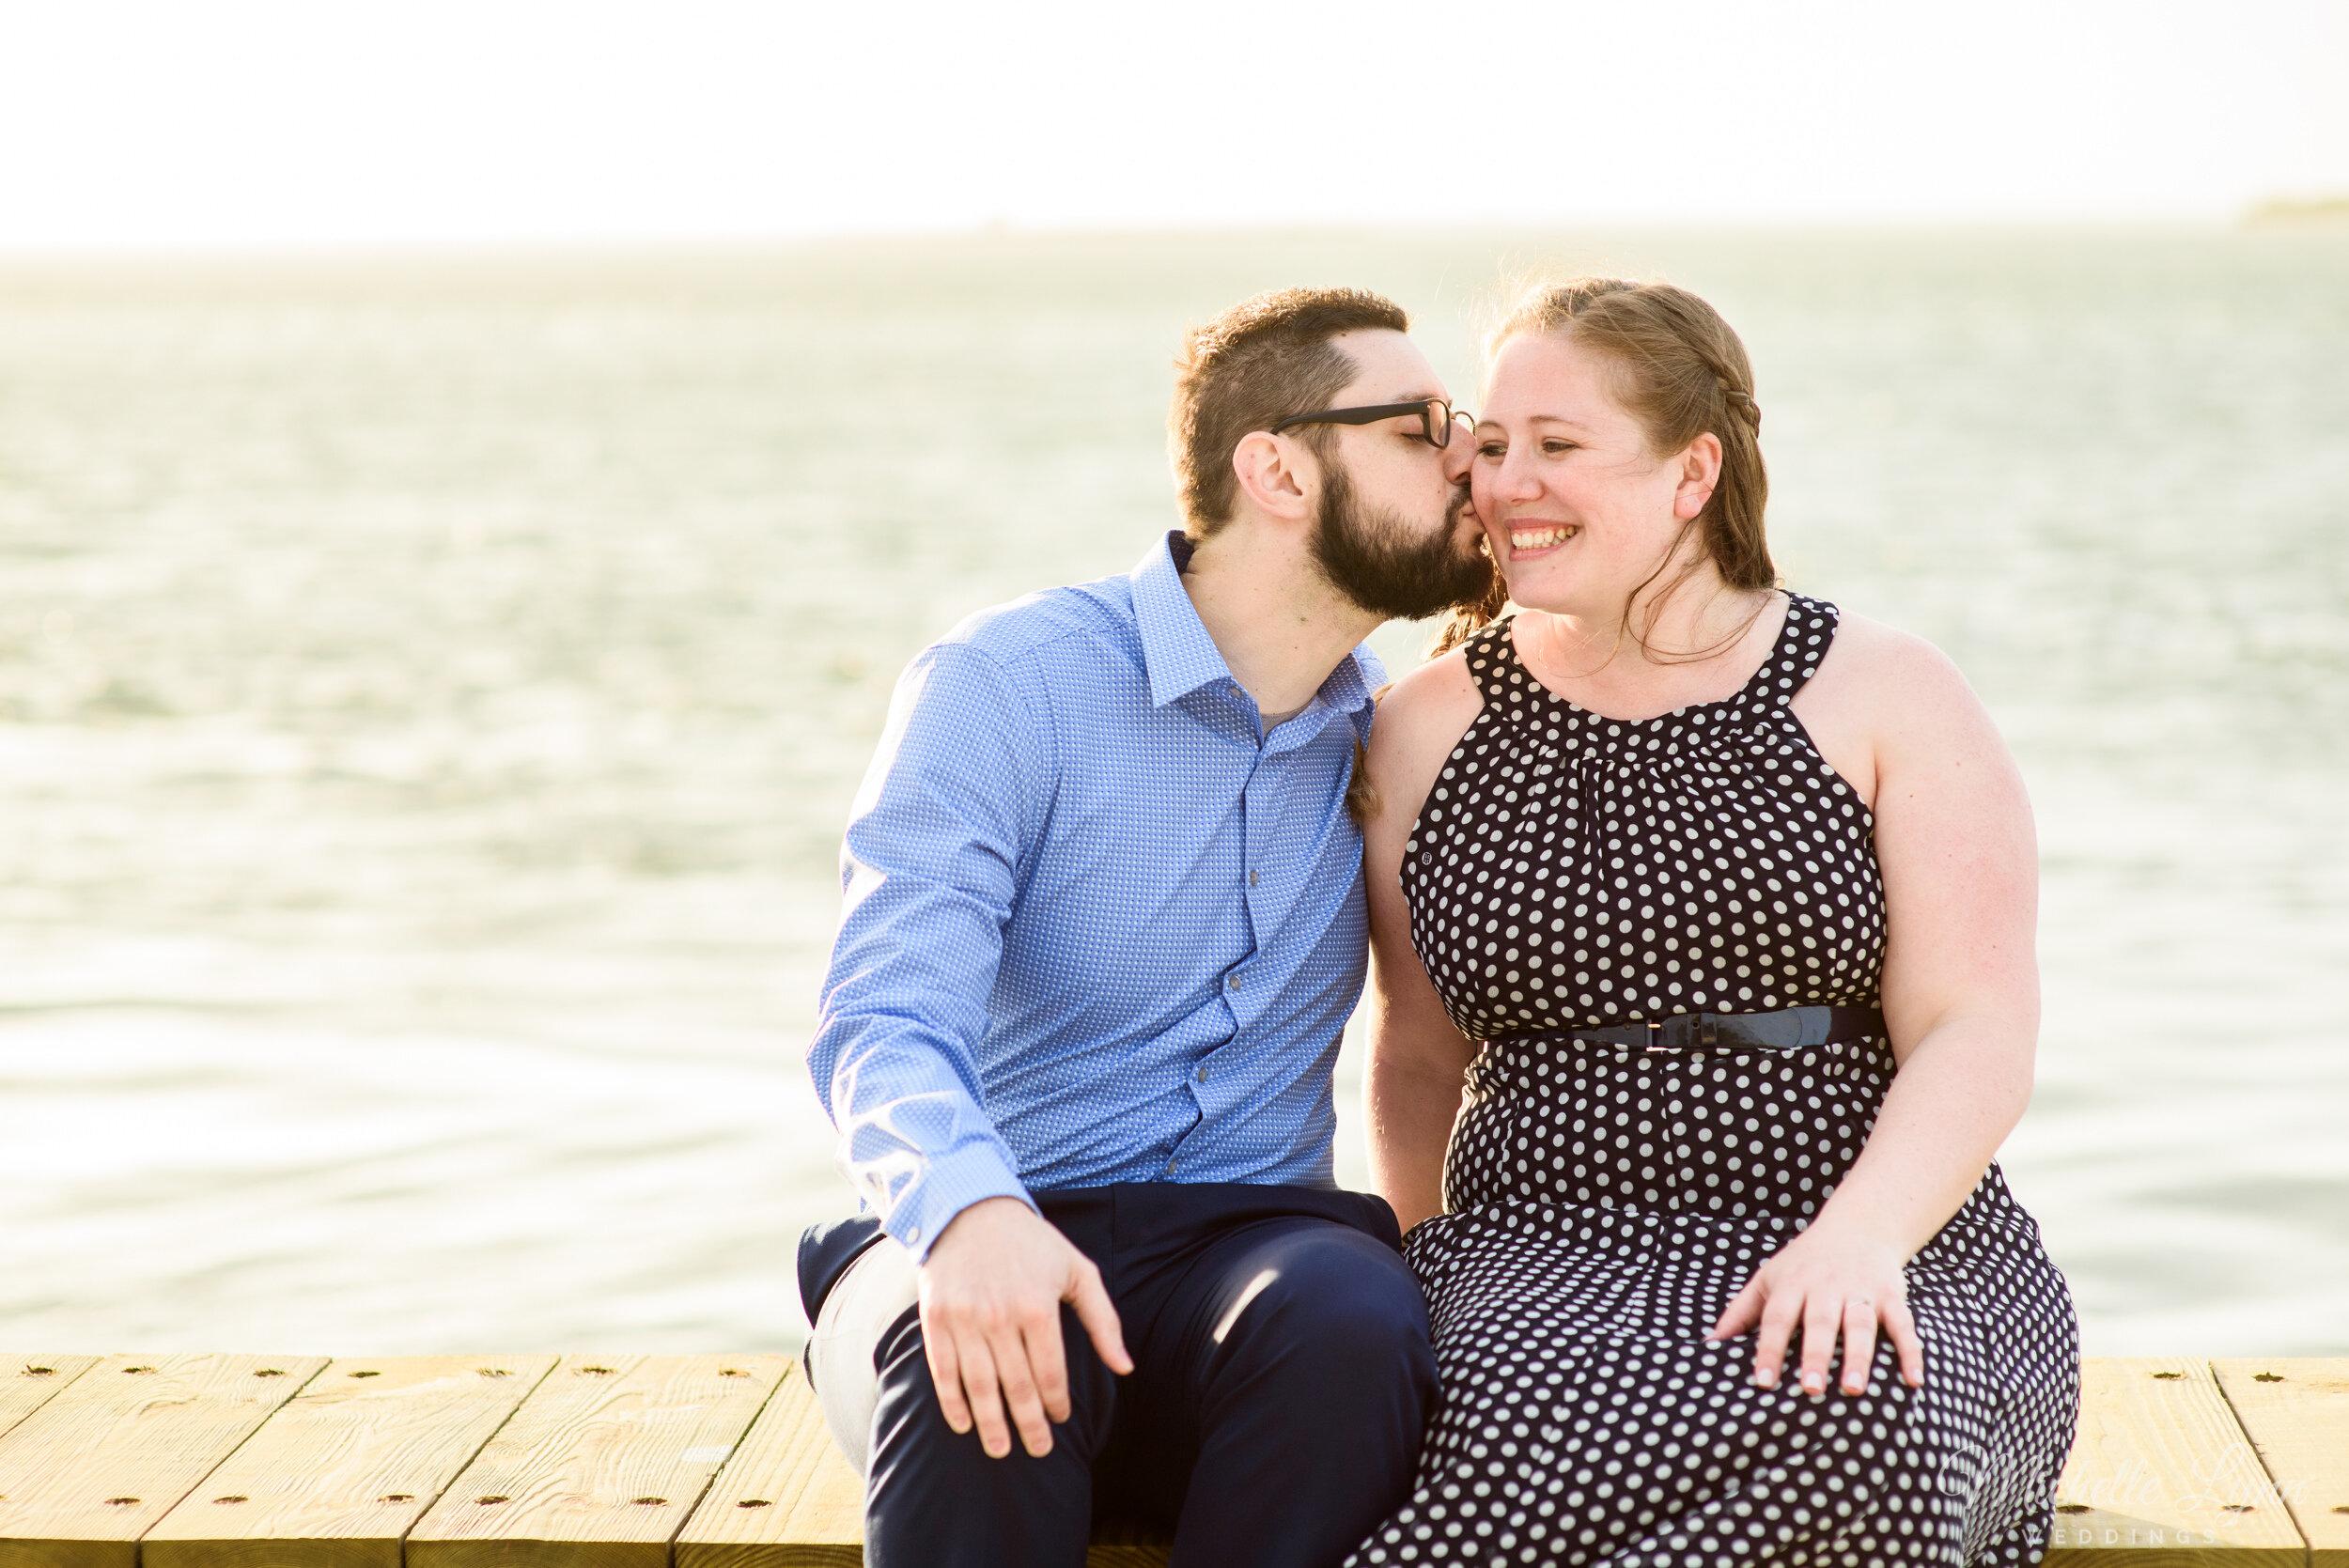 barnegat-lighthouse-engagement-photos-michelle-lynn-weddings-16.jpg